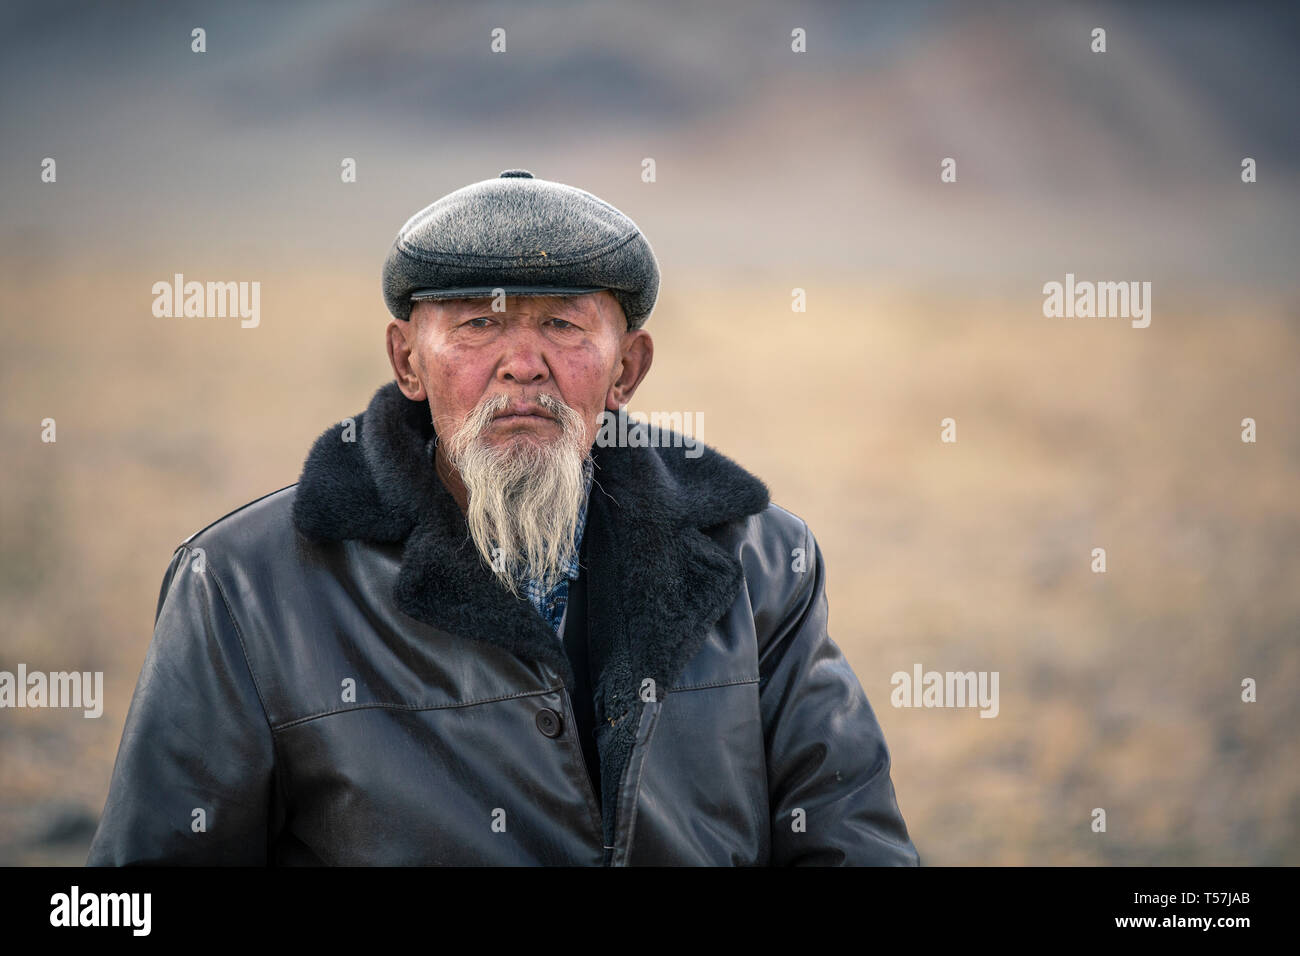 bayan-ulgii-mongolia-3rd-october-2015-ol